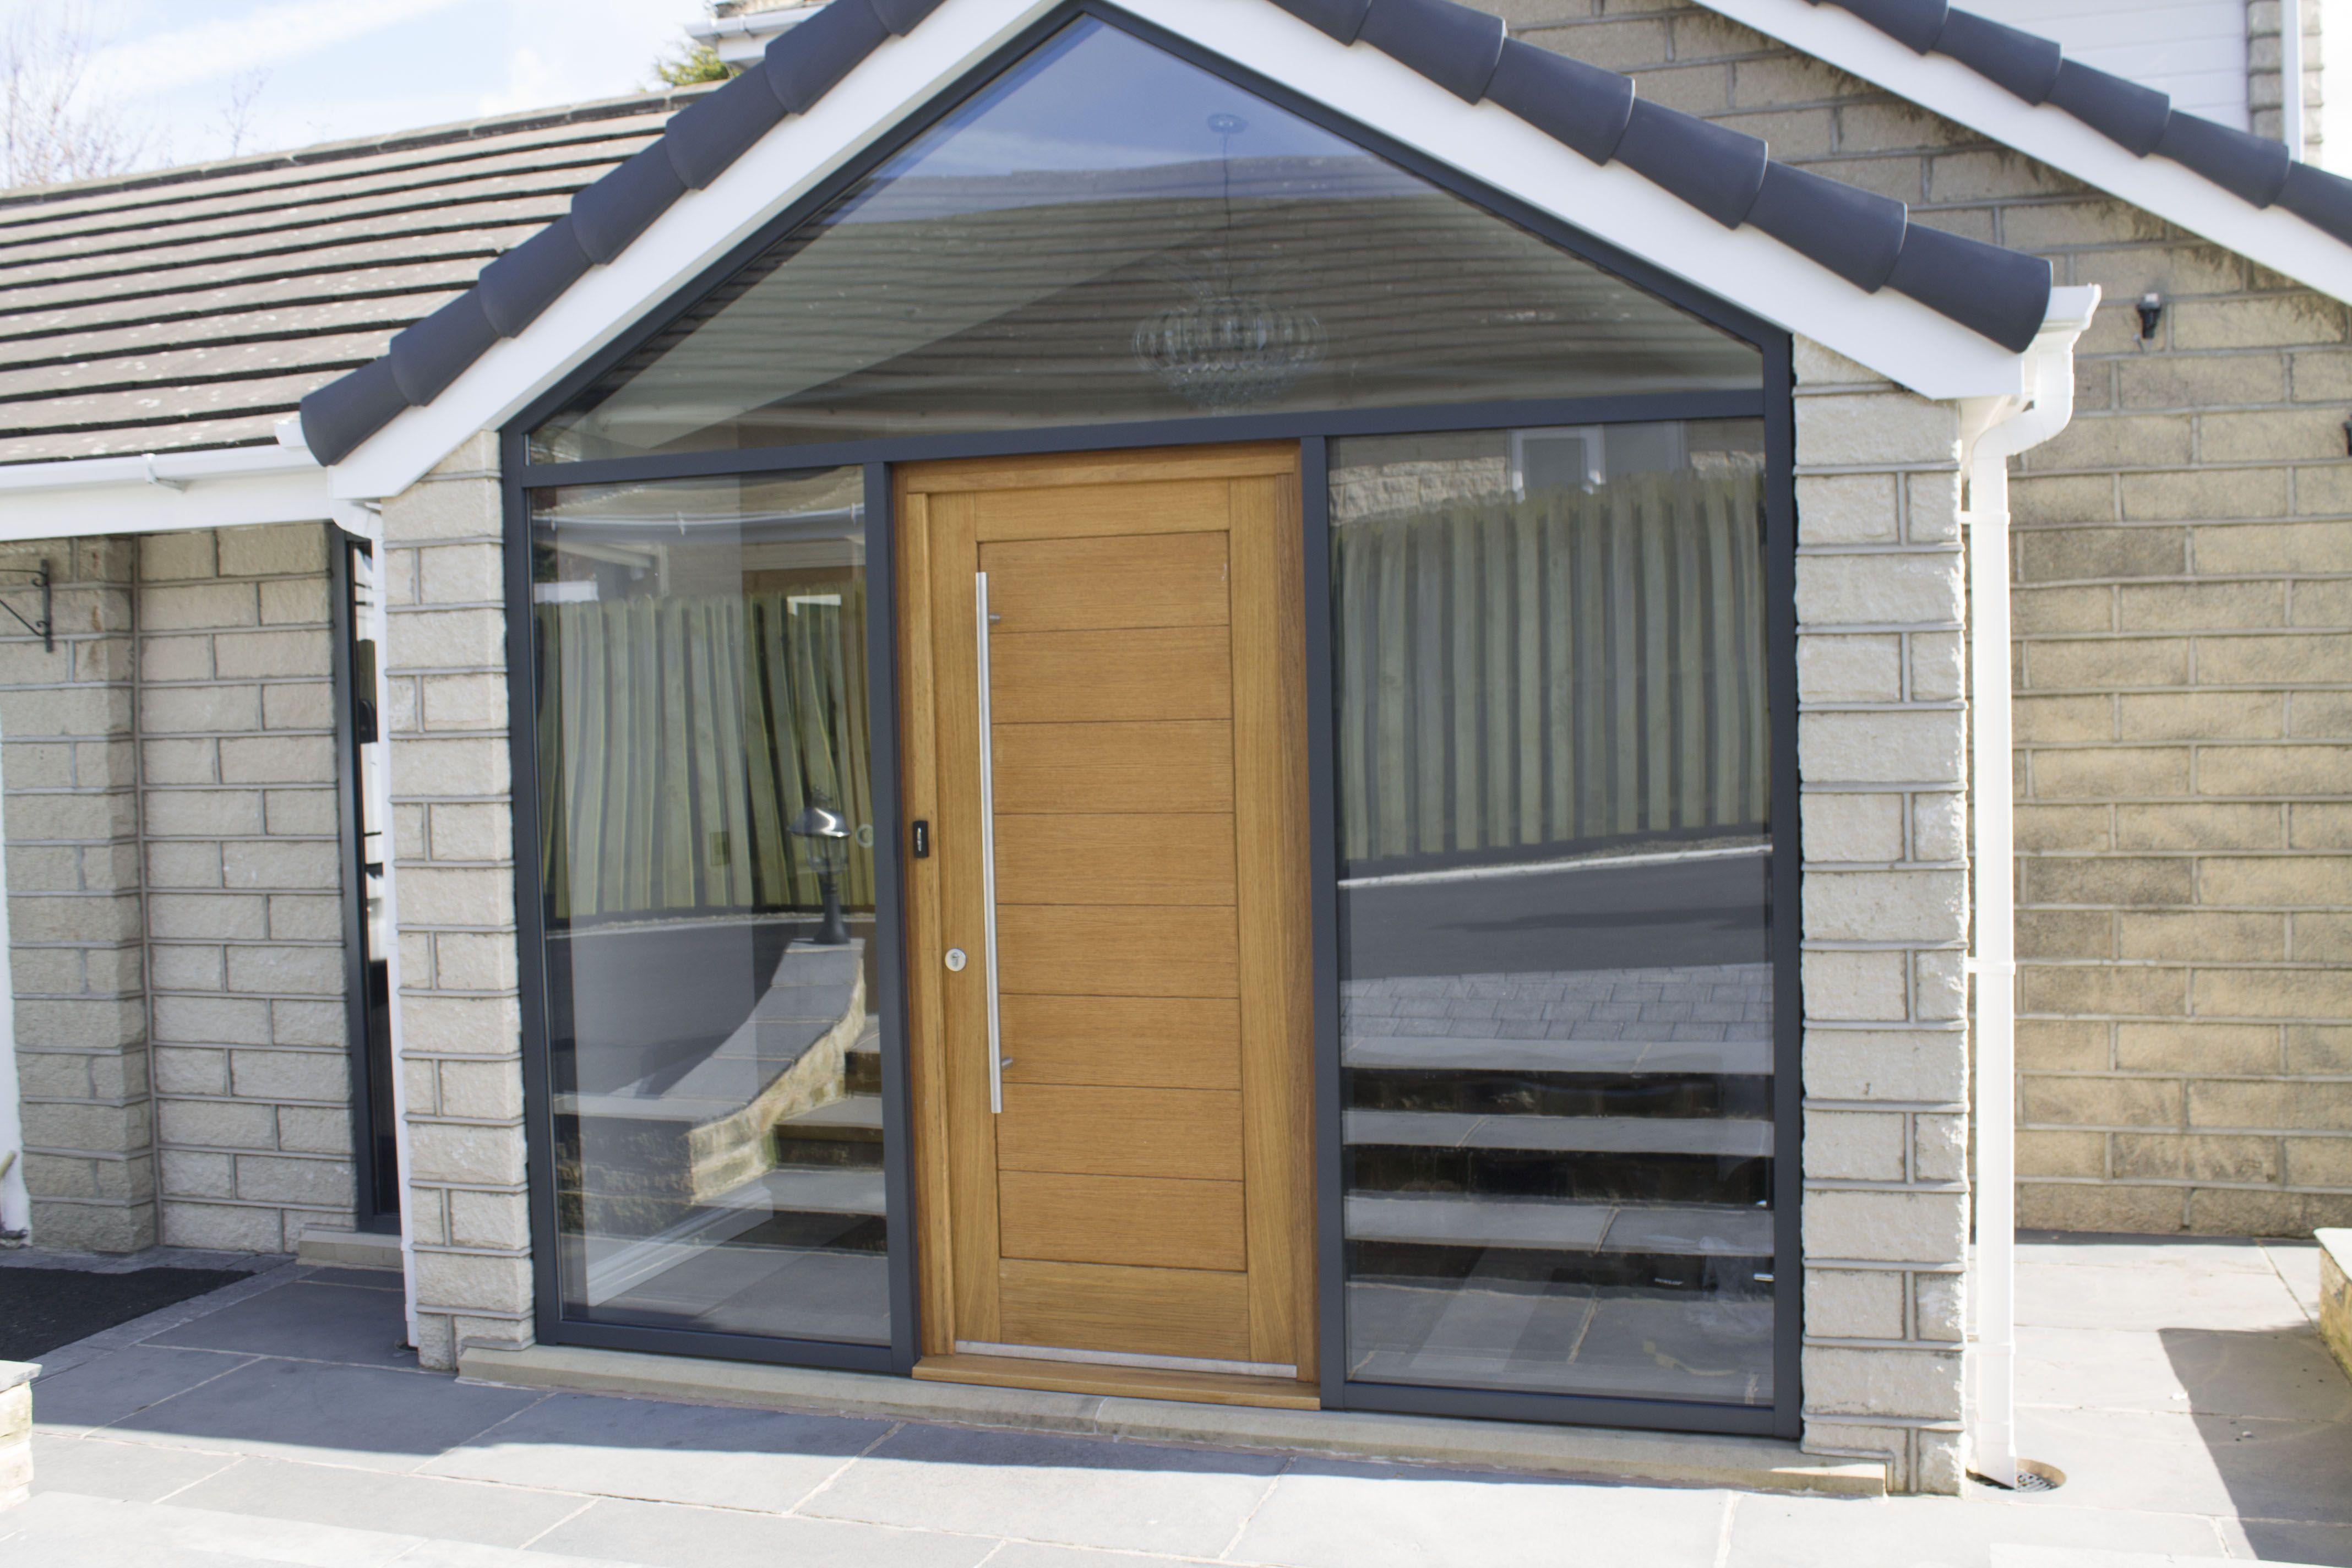 Front Doors Bi Folding DoorsFront Doors Bi Folding Doors   House design ideas   Pinterest   Bi  . Folding Exterior Doors Uk. Home Design Ideas